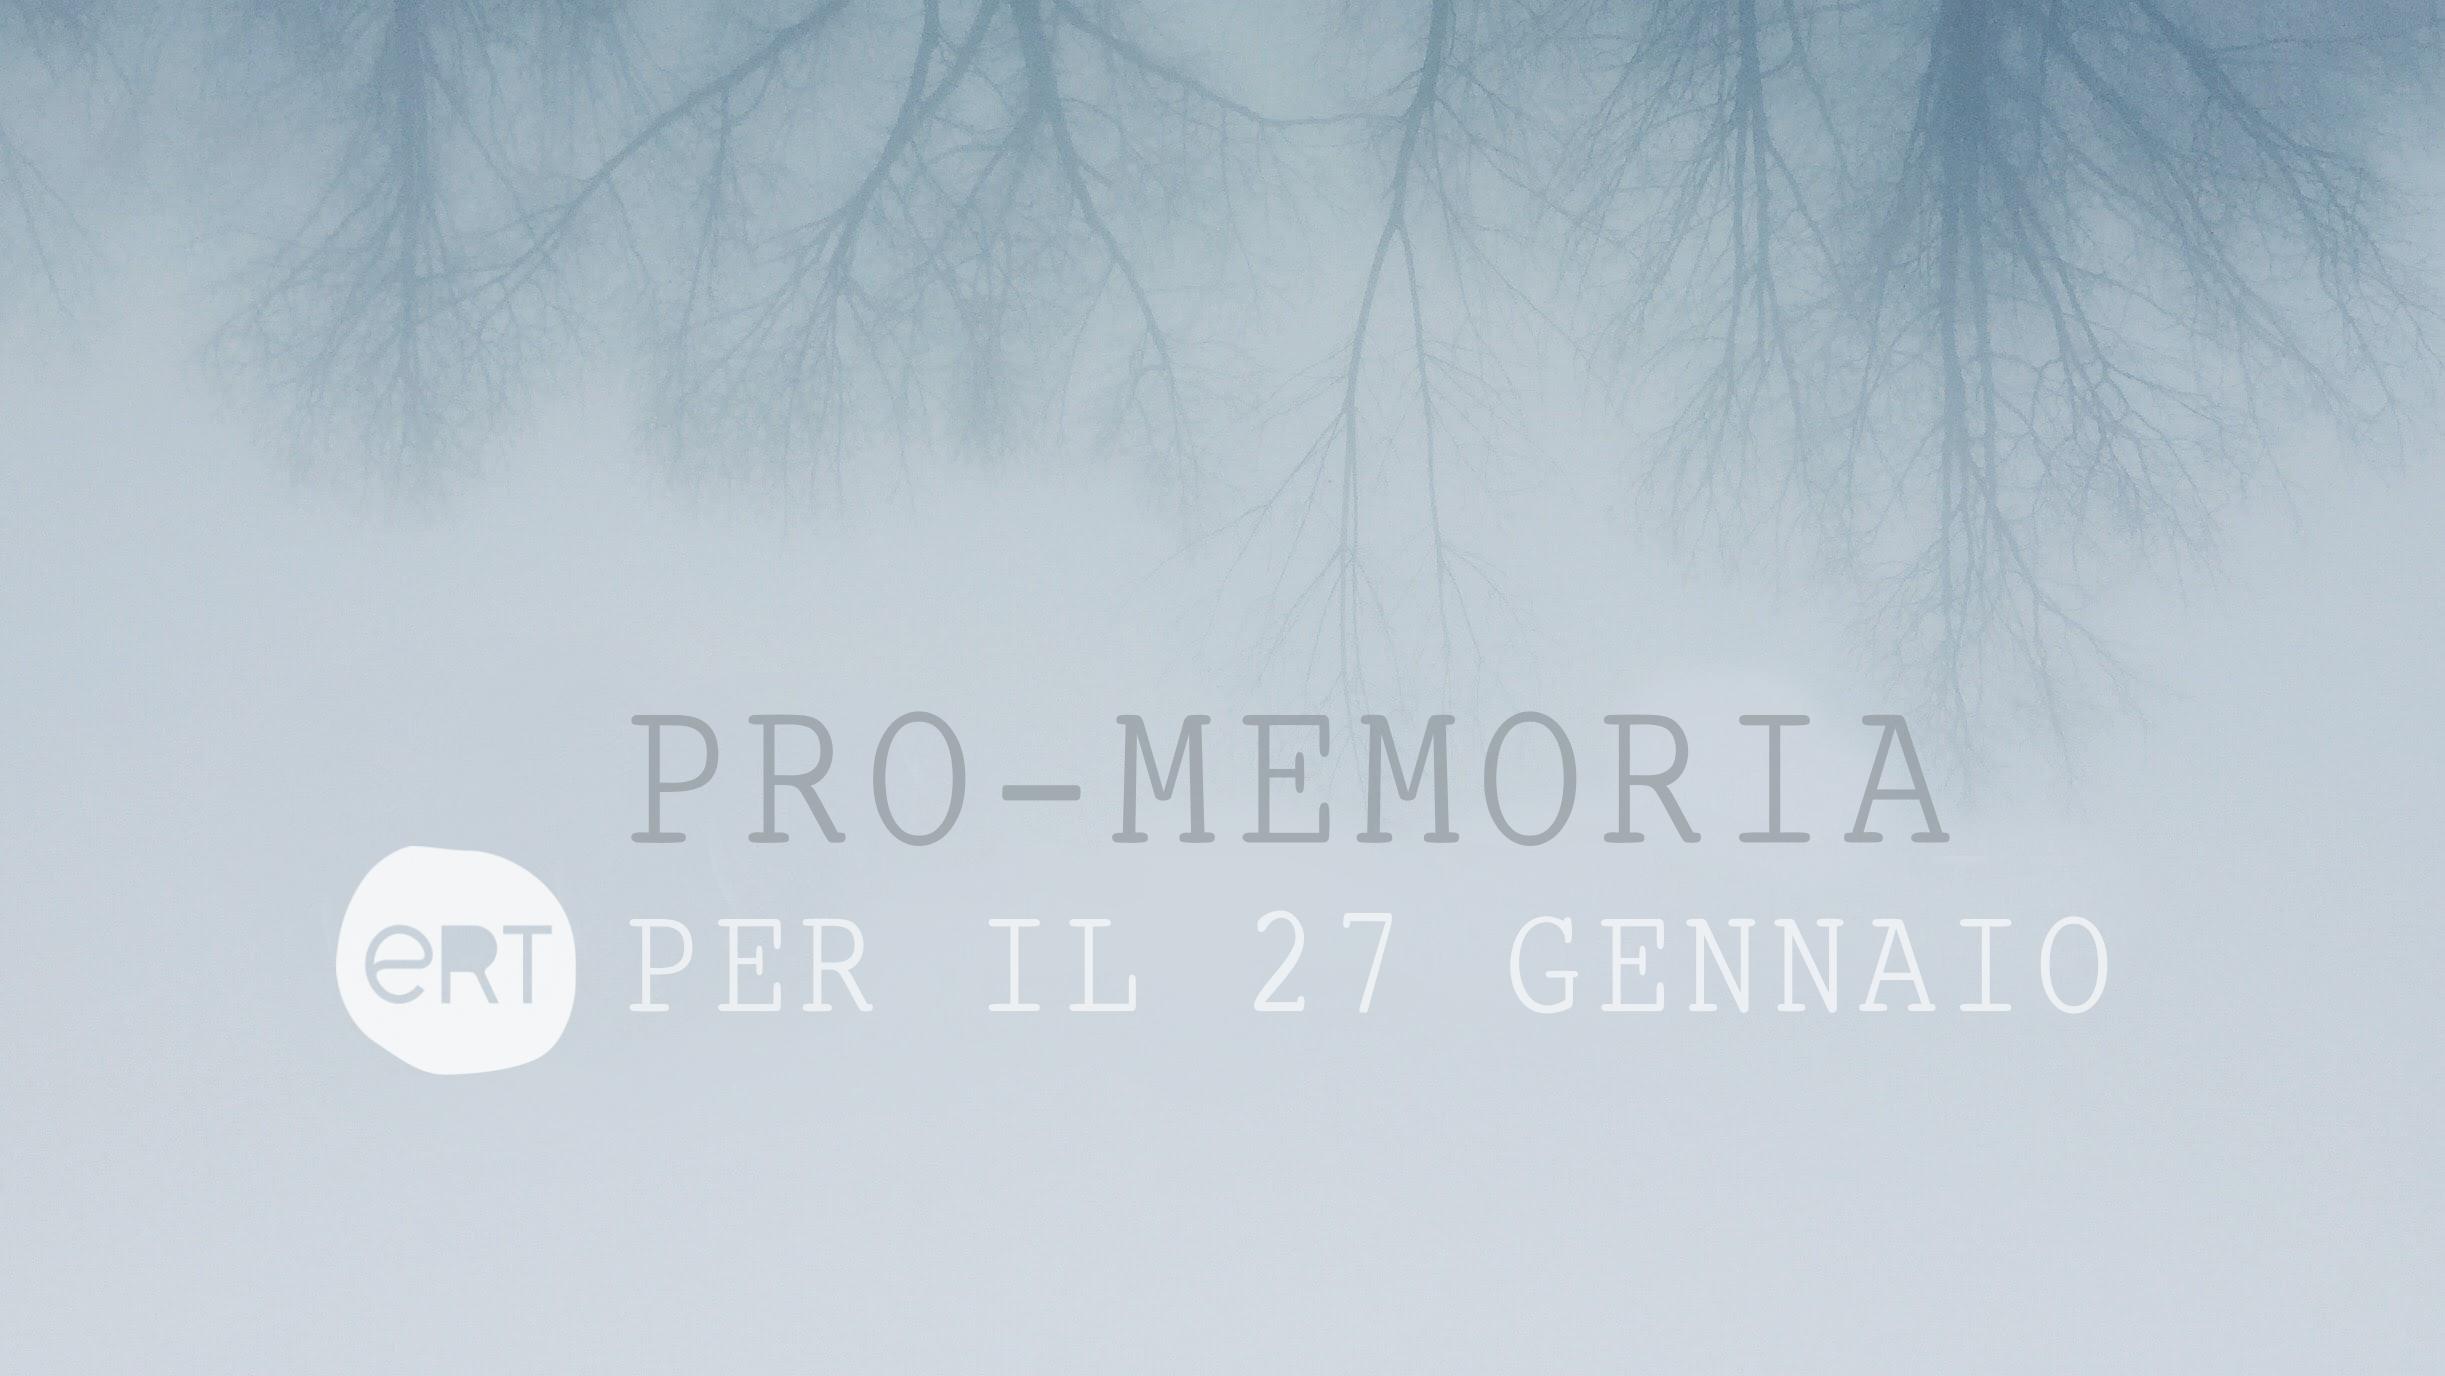 Pro-memoria. ERT